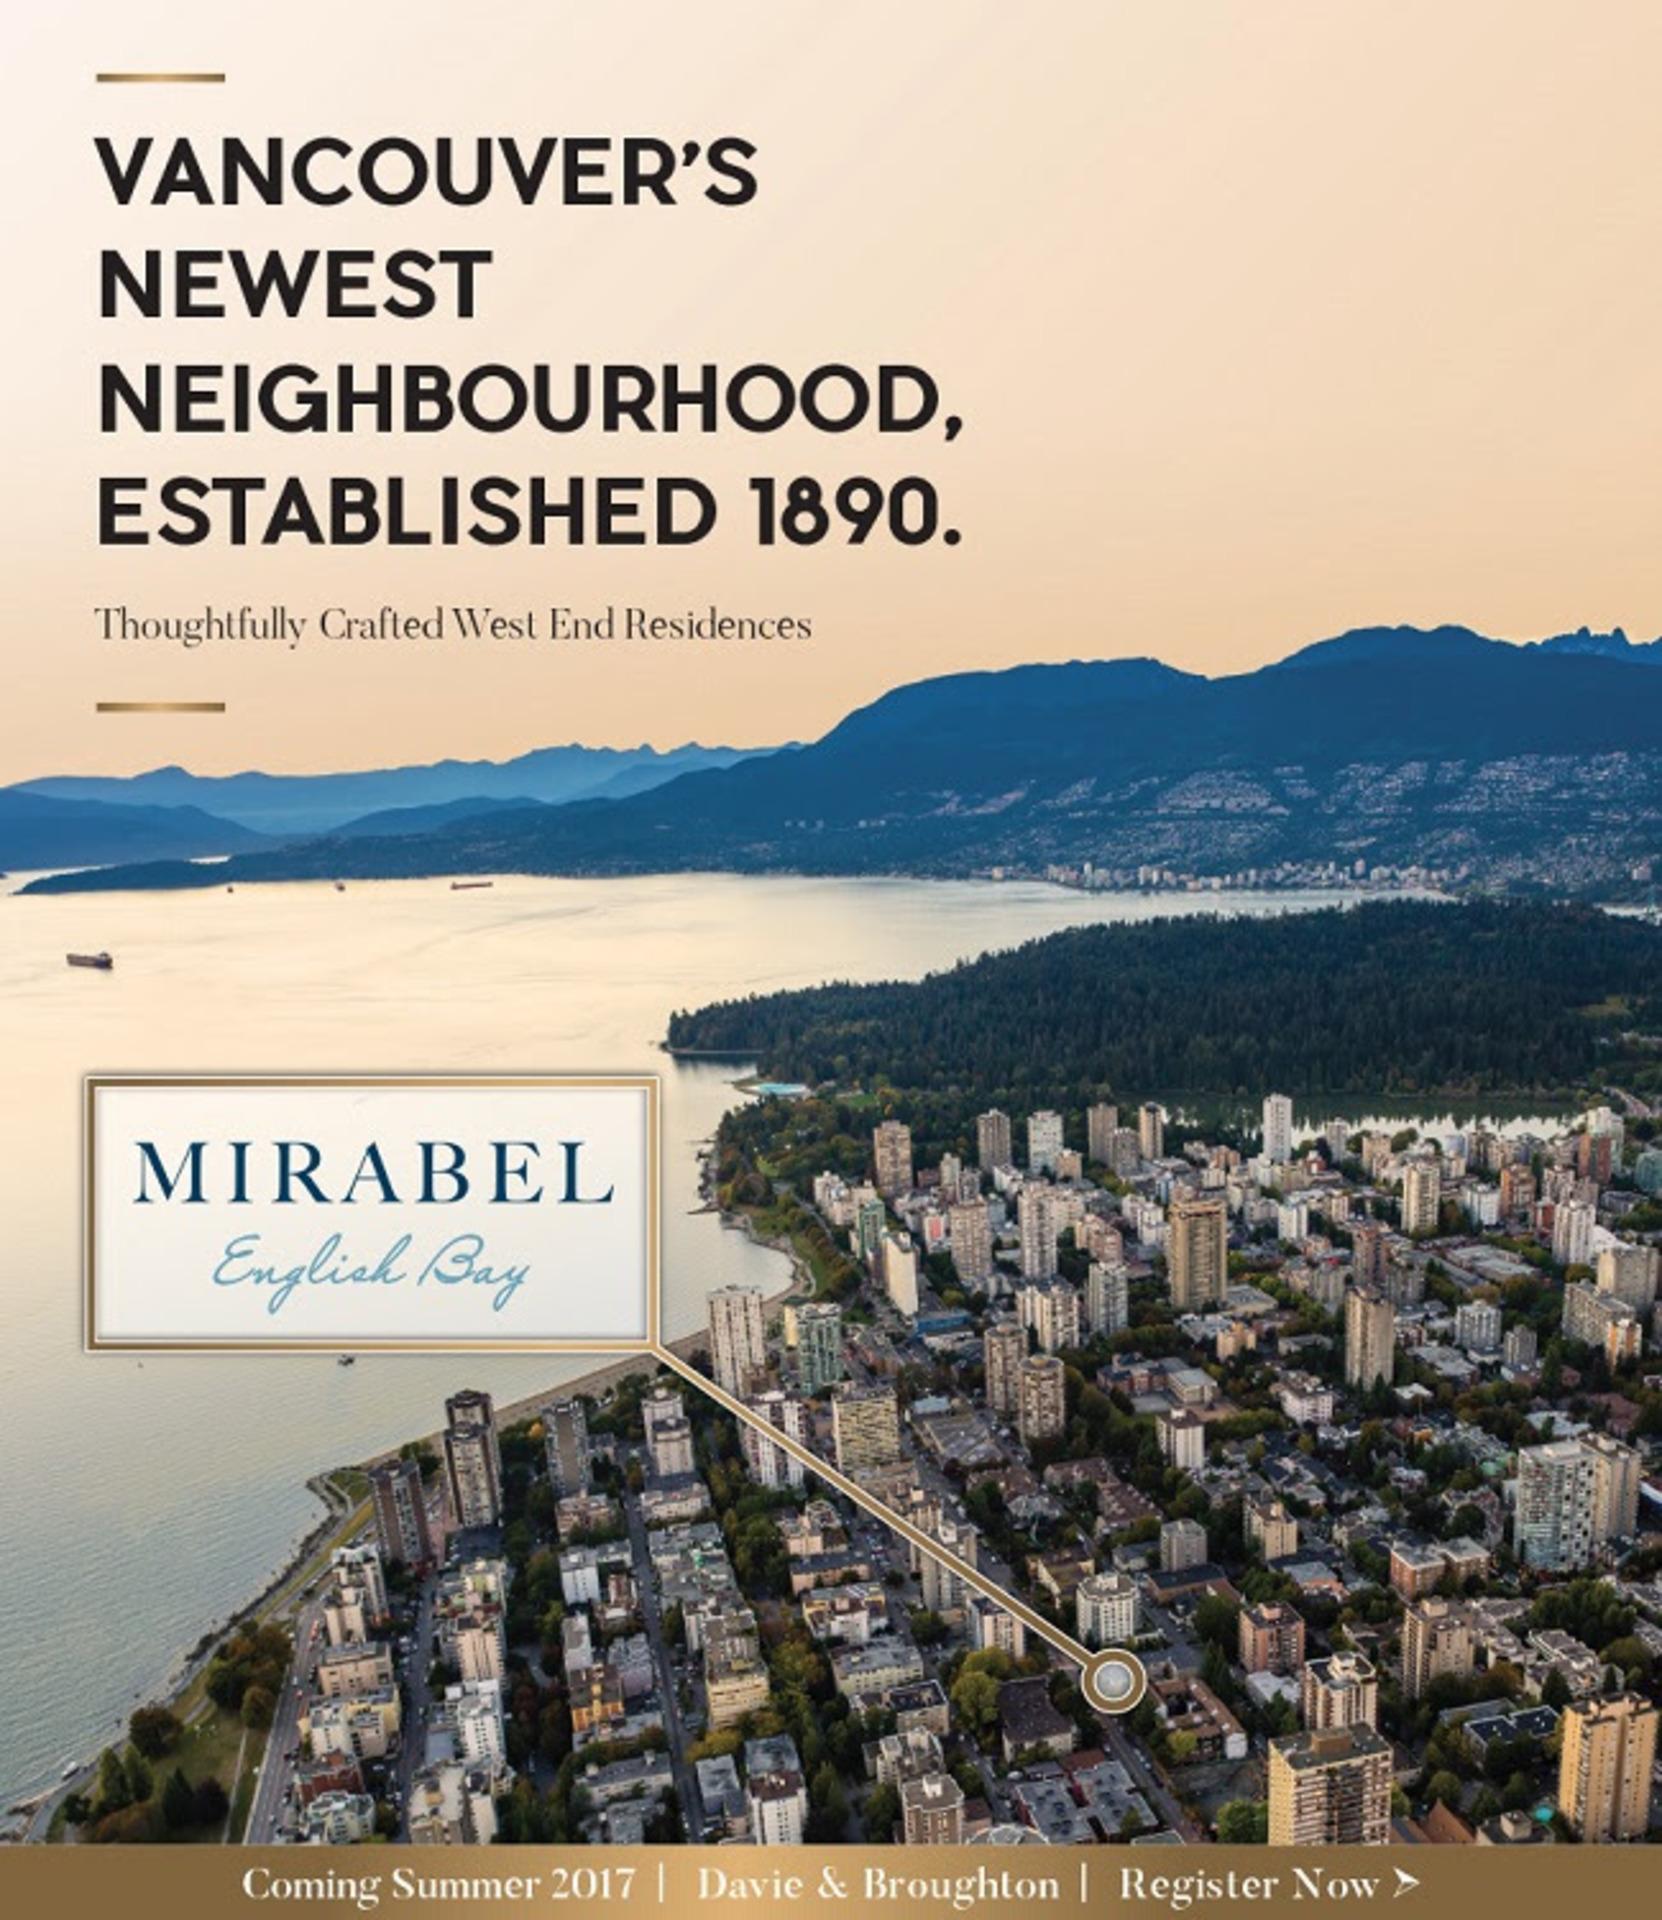 Mirabel-1 at 1345 Davie Street, West End VW, Vancouver West